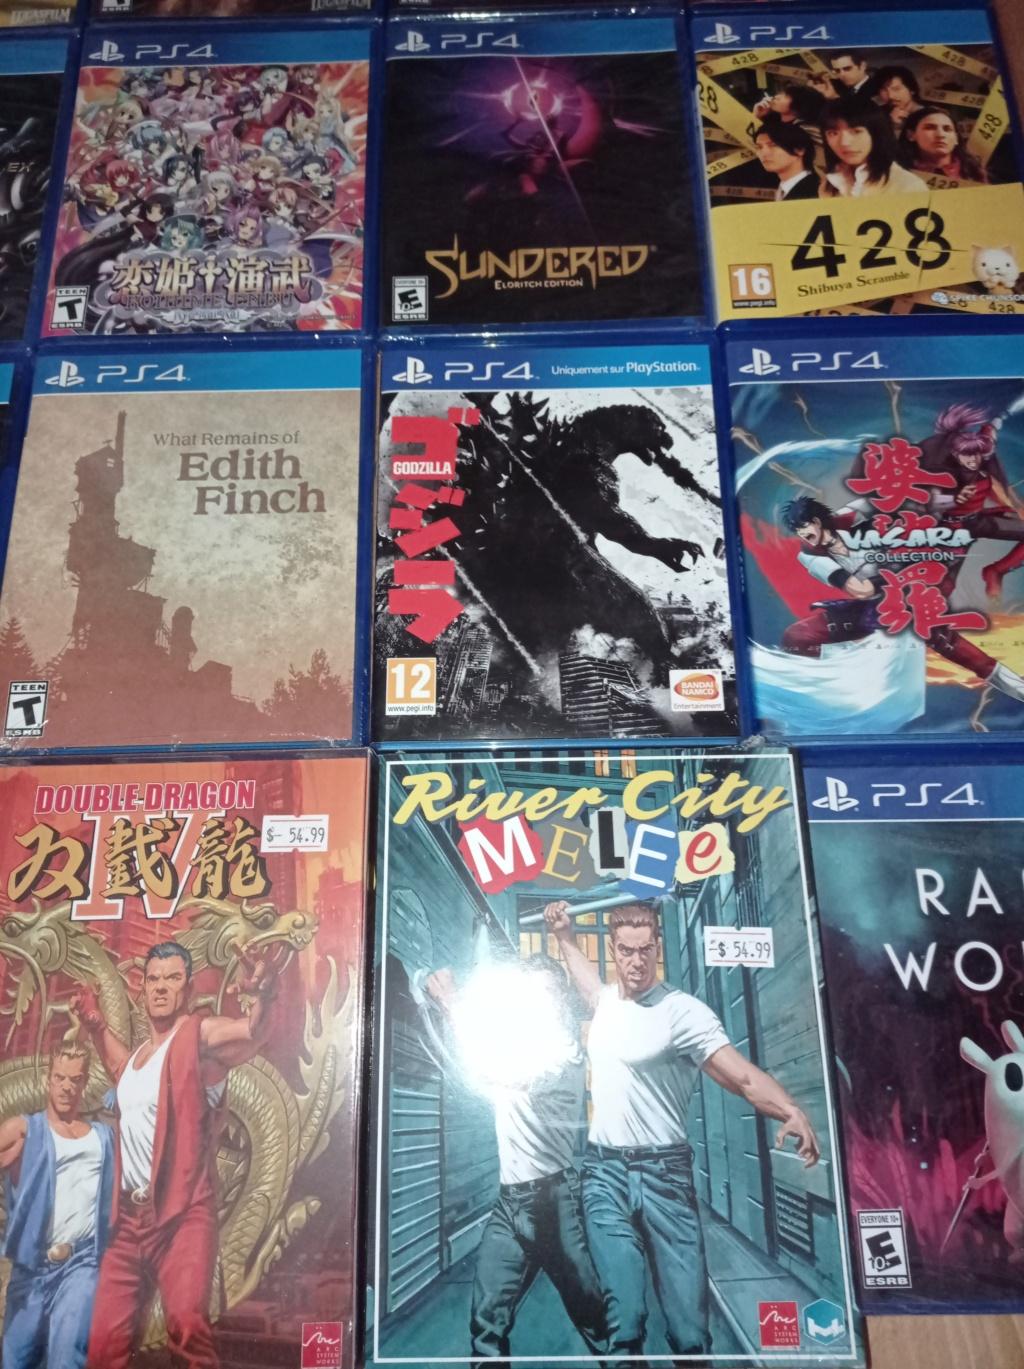 [VDS] Jeux Switch, Ps4, Ps Vita, Xbox, Gameboy, Snes, DC, LRG, SRG, SLG  Img_2027